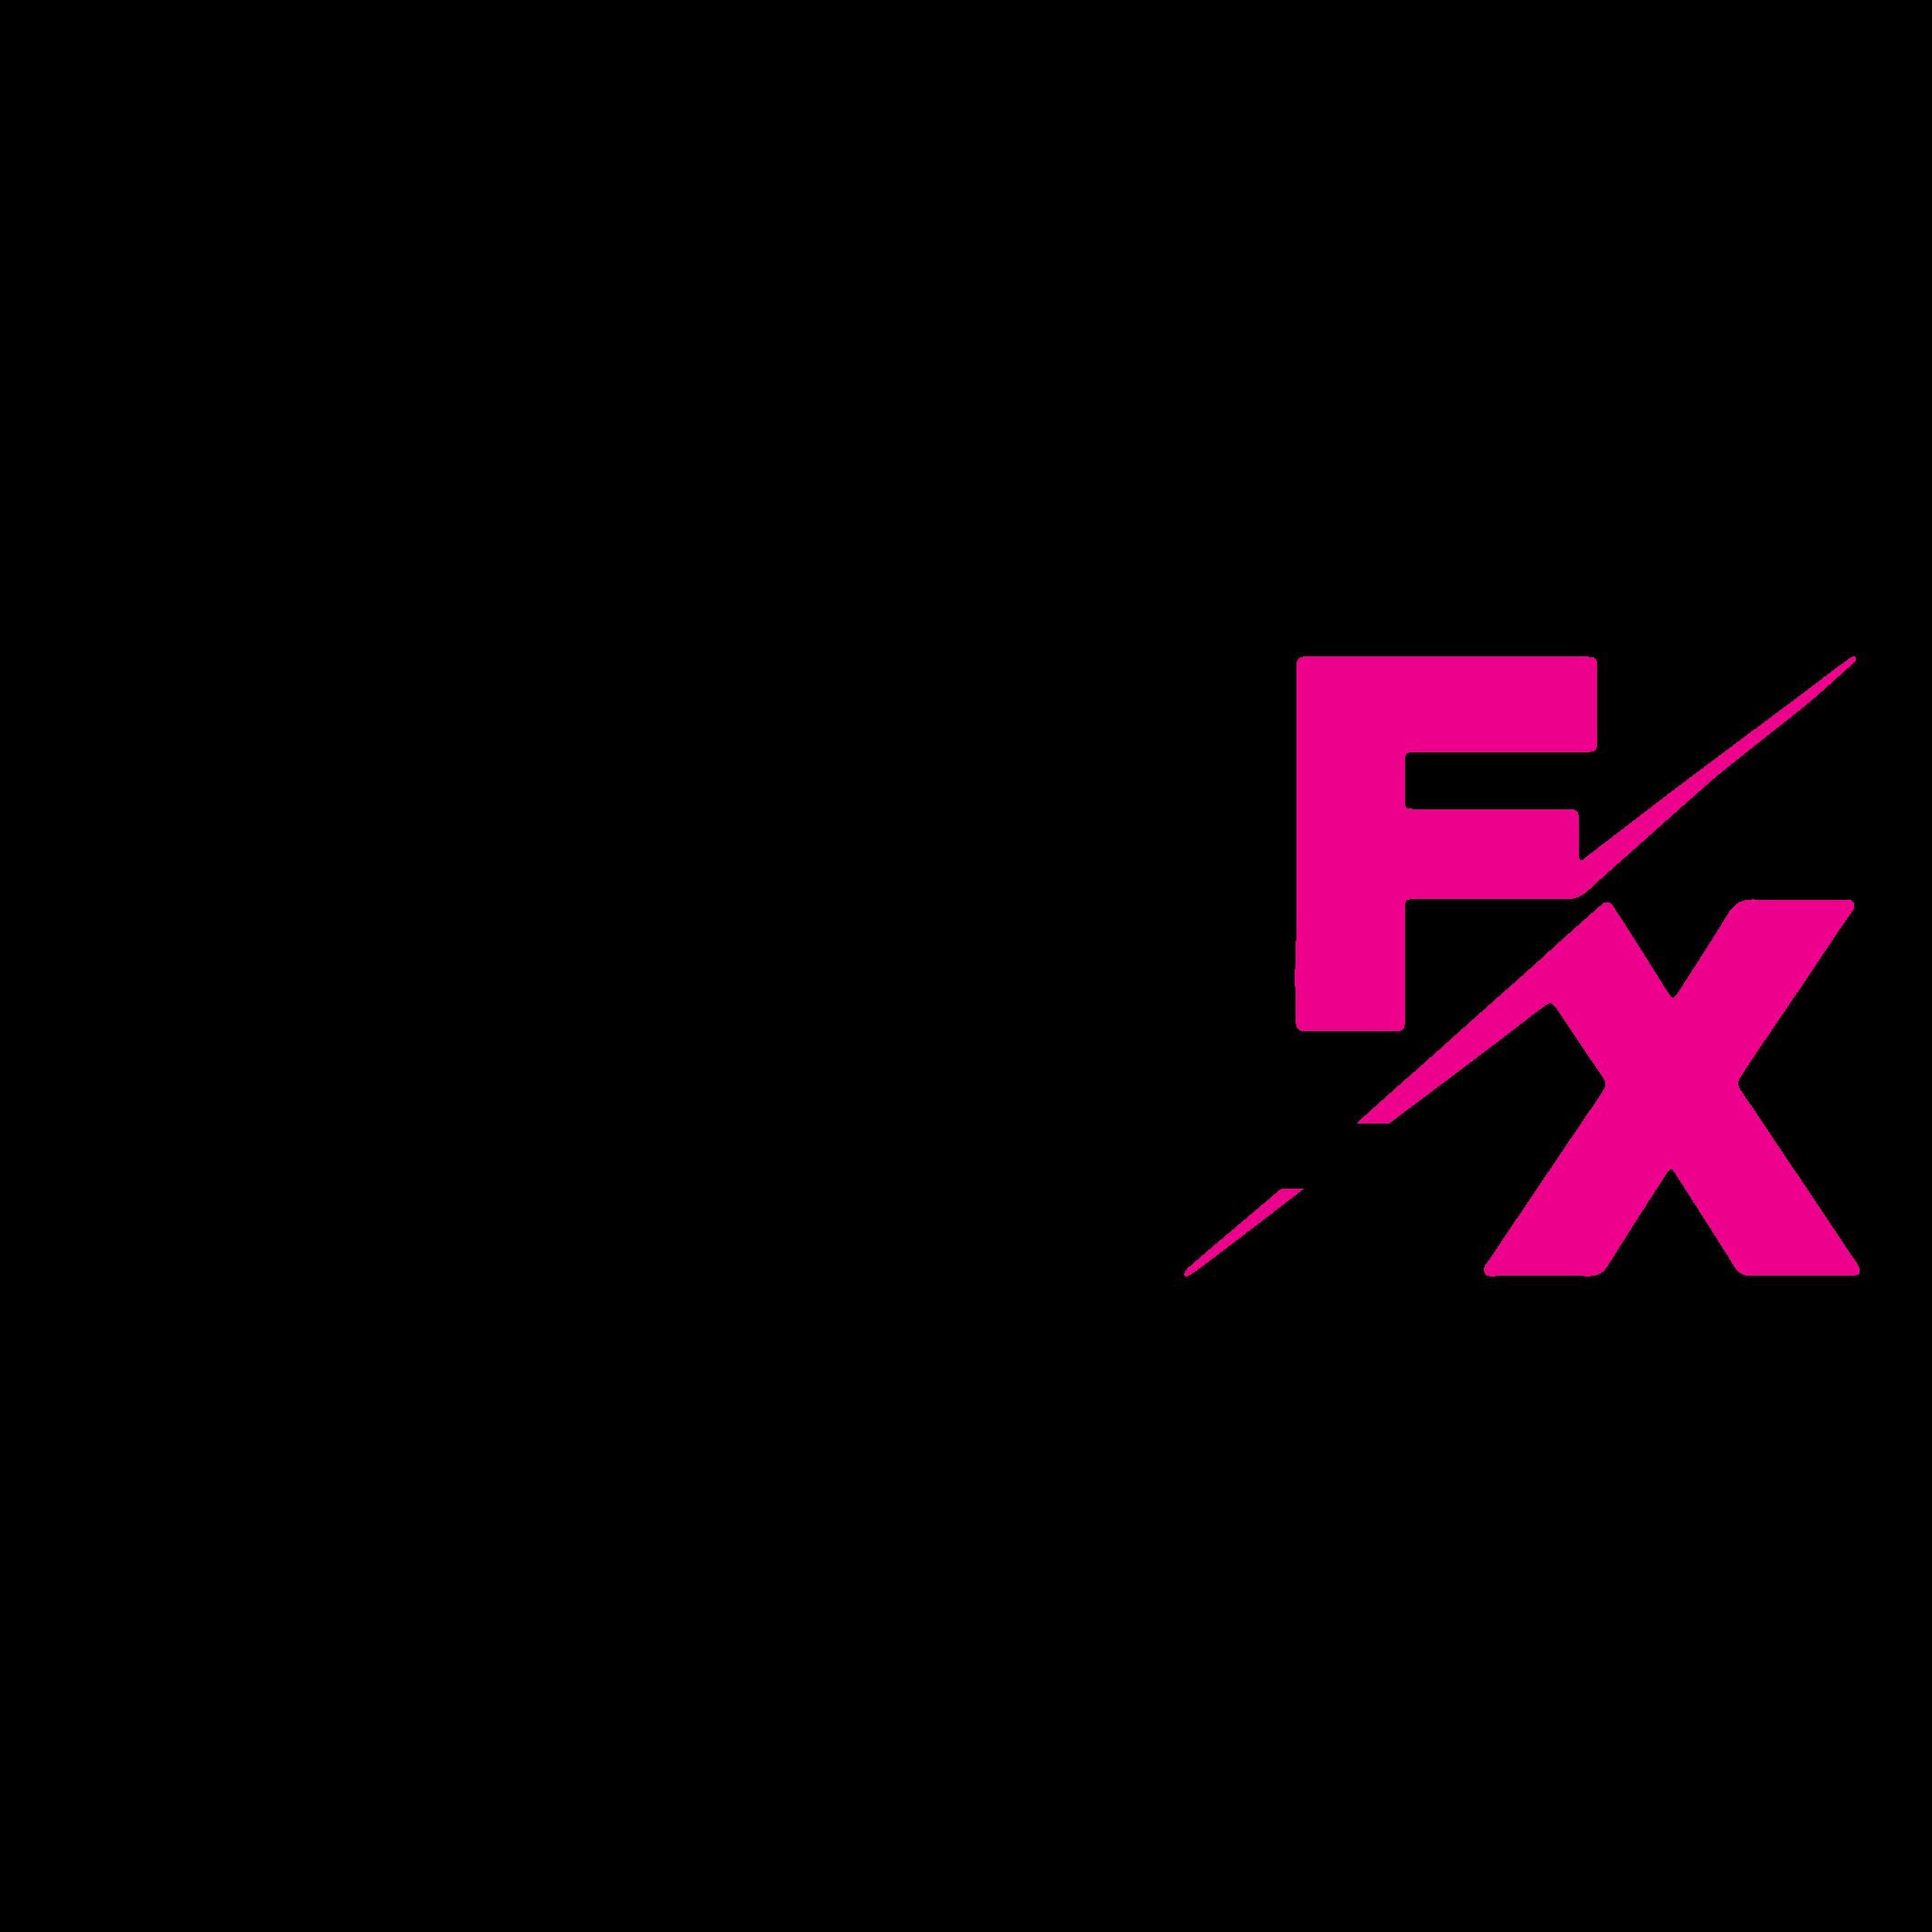 Live FX